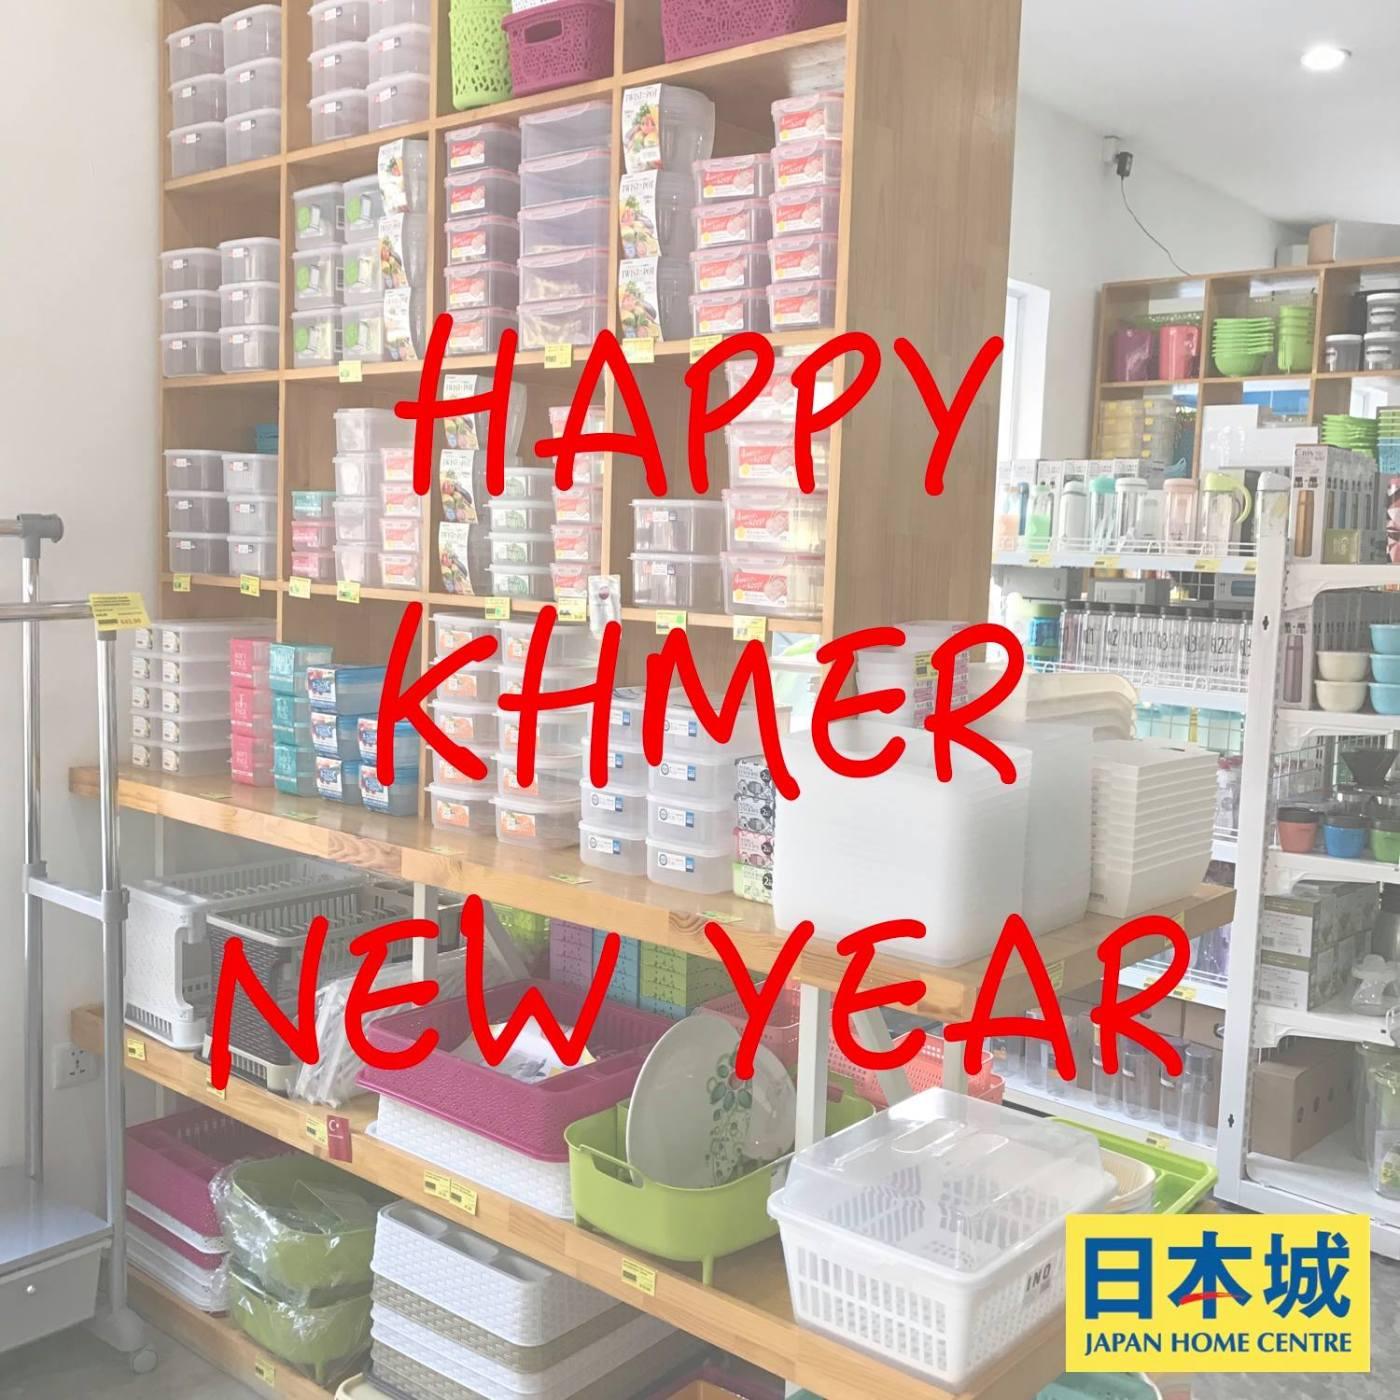 Happy Khmer New Year 2018.jpg